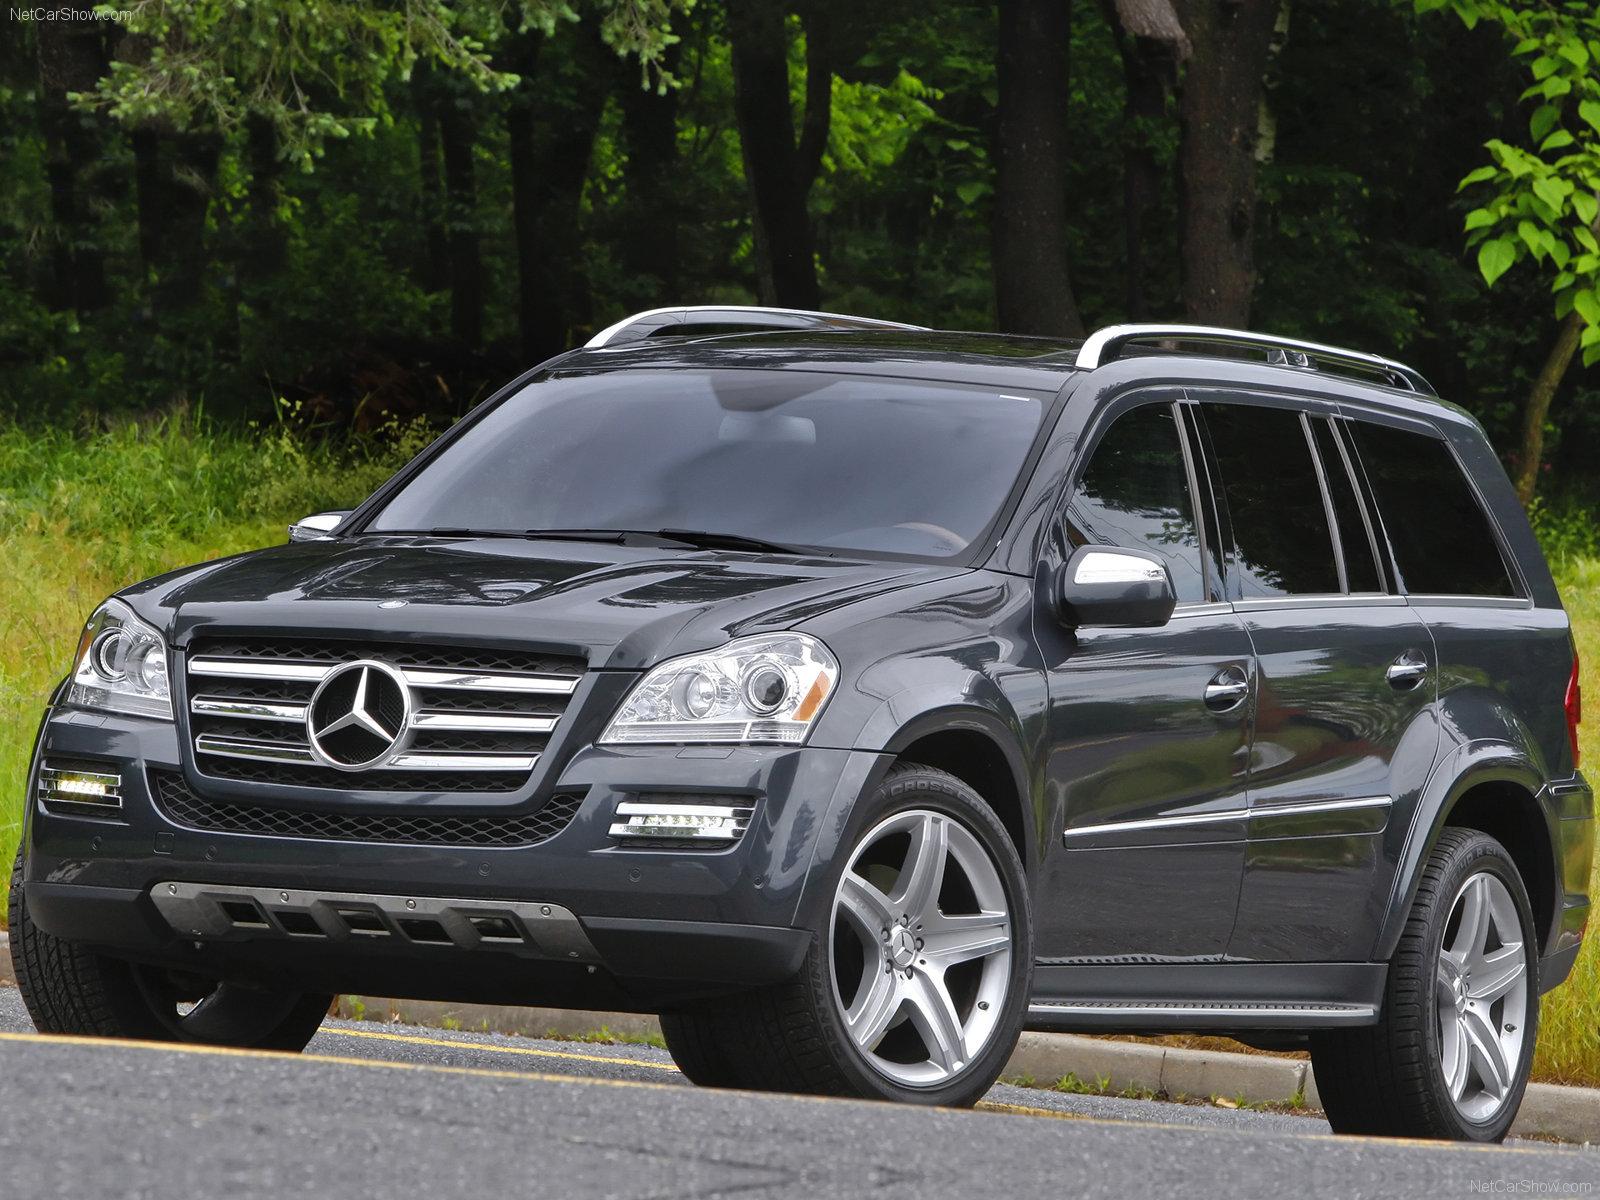 Mercedes gl class suv 2010